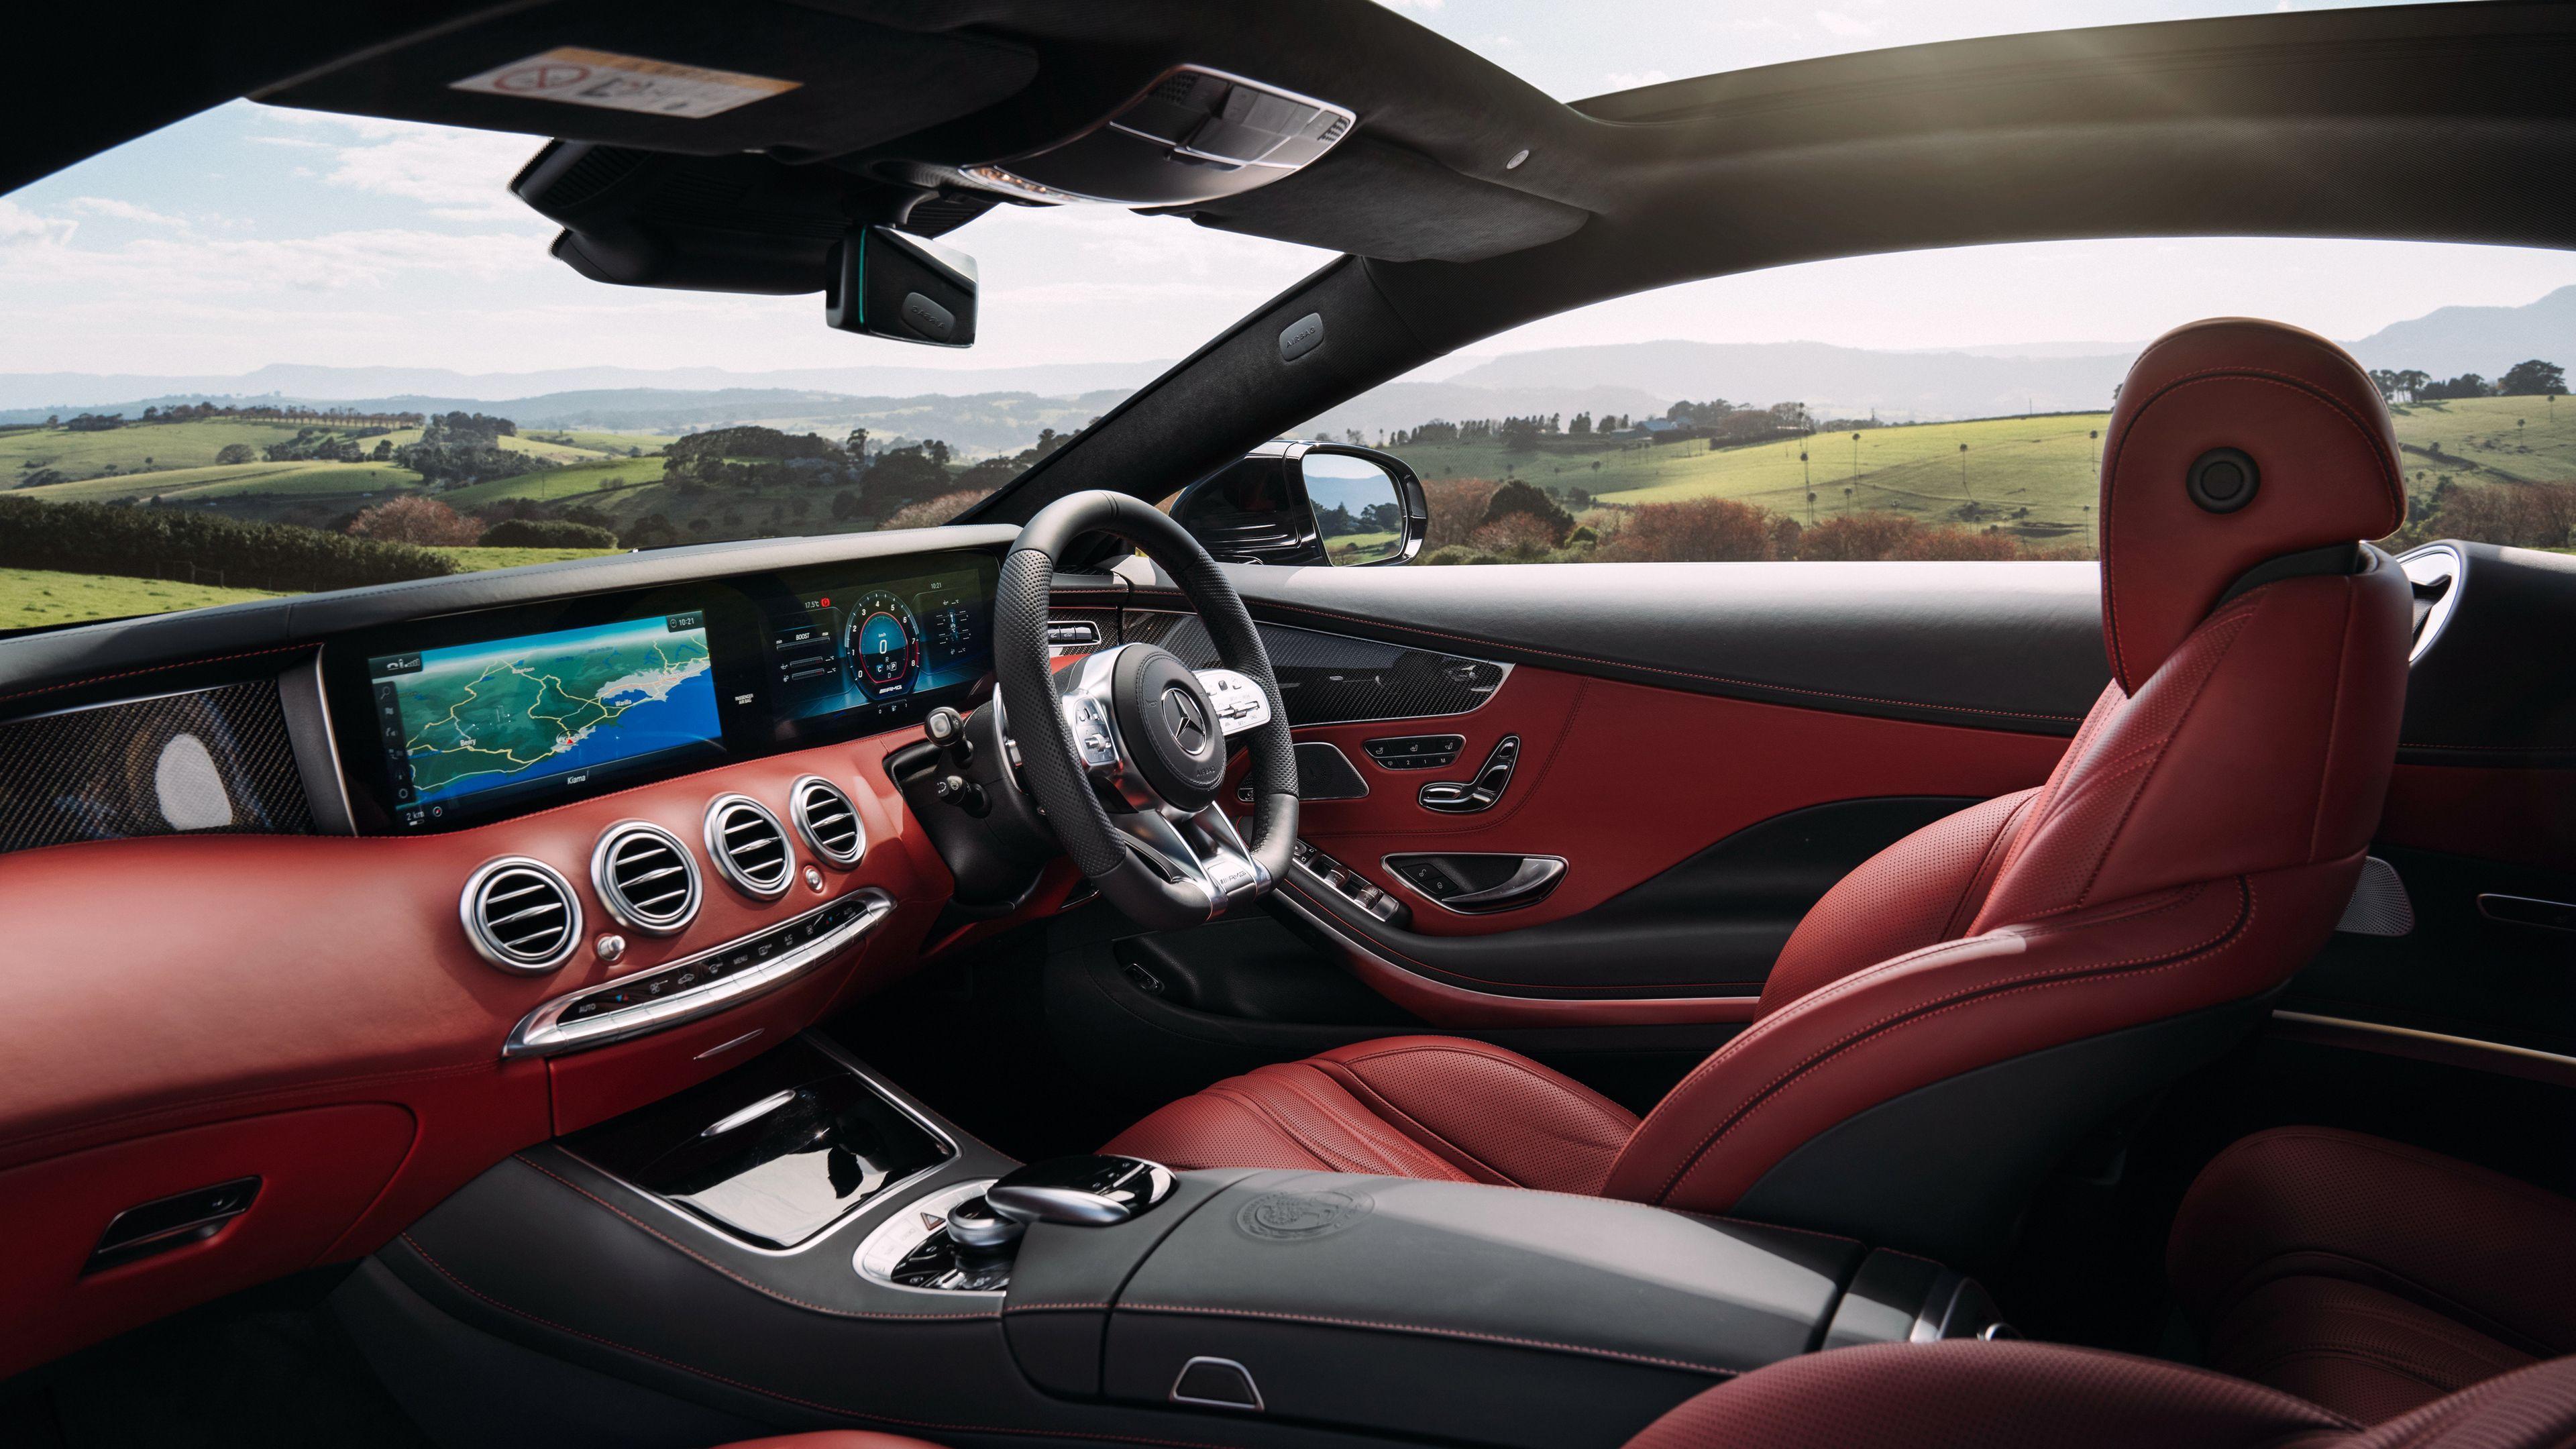 Wallpaper 4k Mercedes Amg S63 2018 Interior 2018 Cars Wallpapers